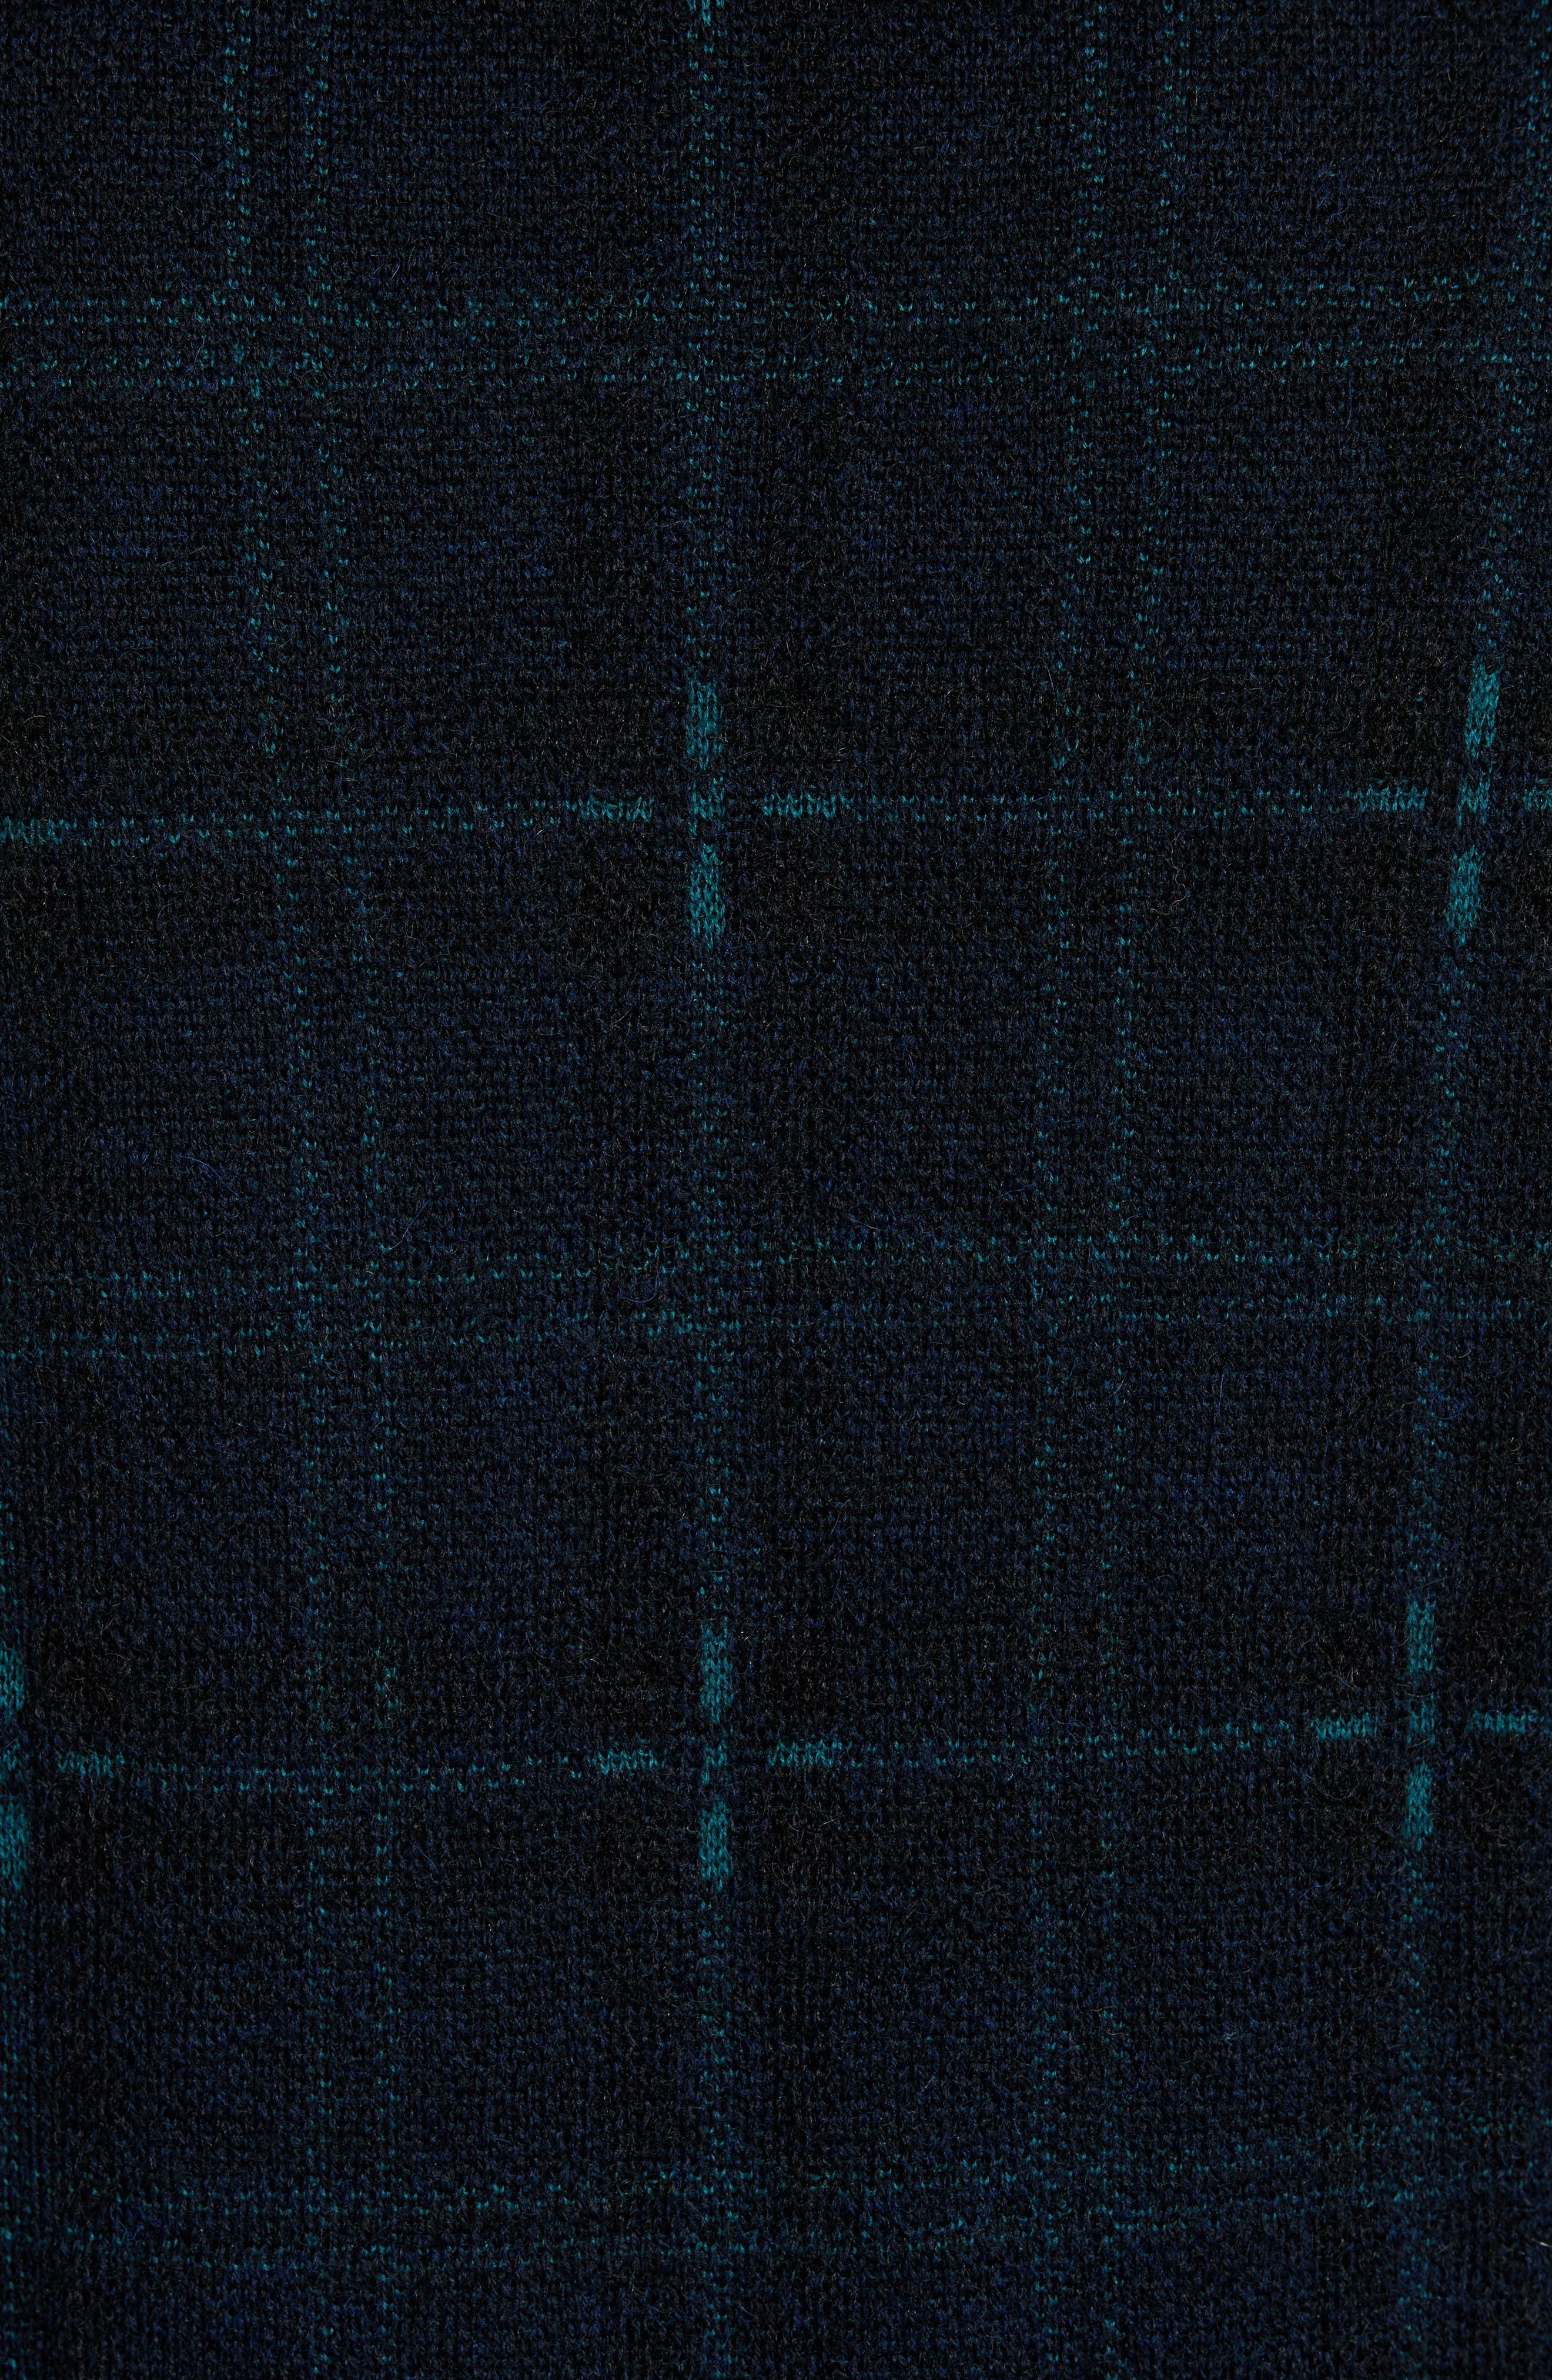 Wool Blend Knit Sportcoat,                             Alternate thumbnail 5, color,                             Navy